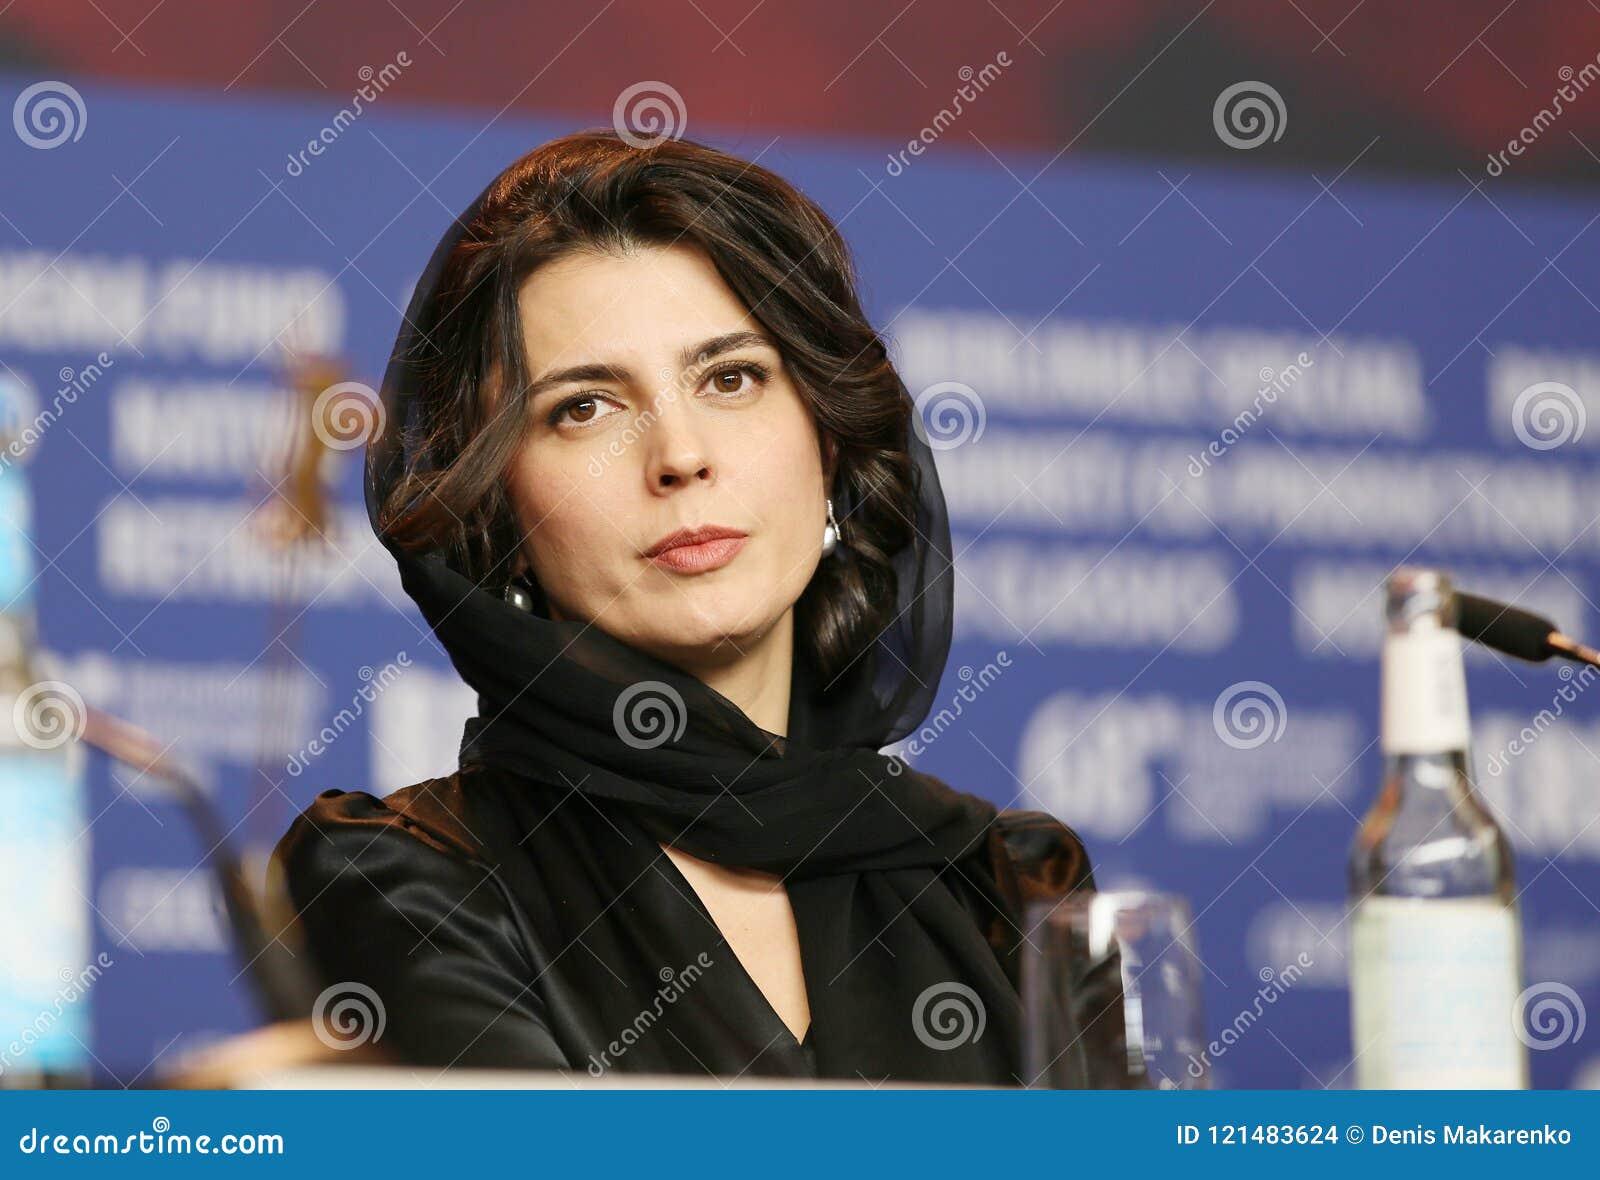 Watch Leila Hatami video